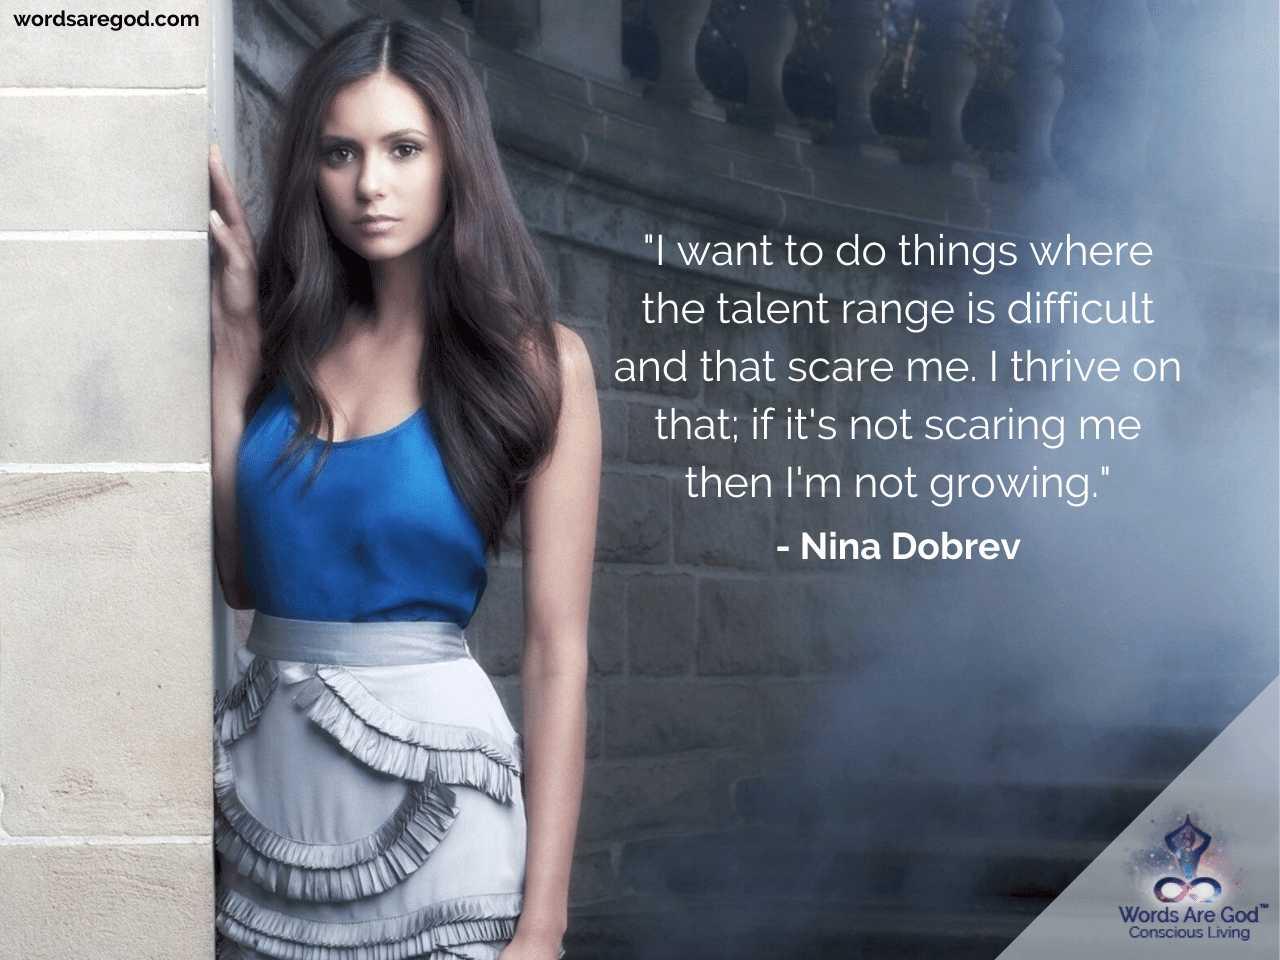 Nina Dobrev Inspirational Quotes